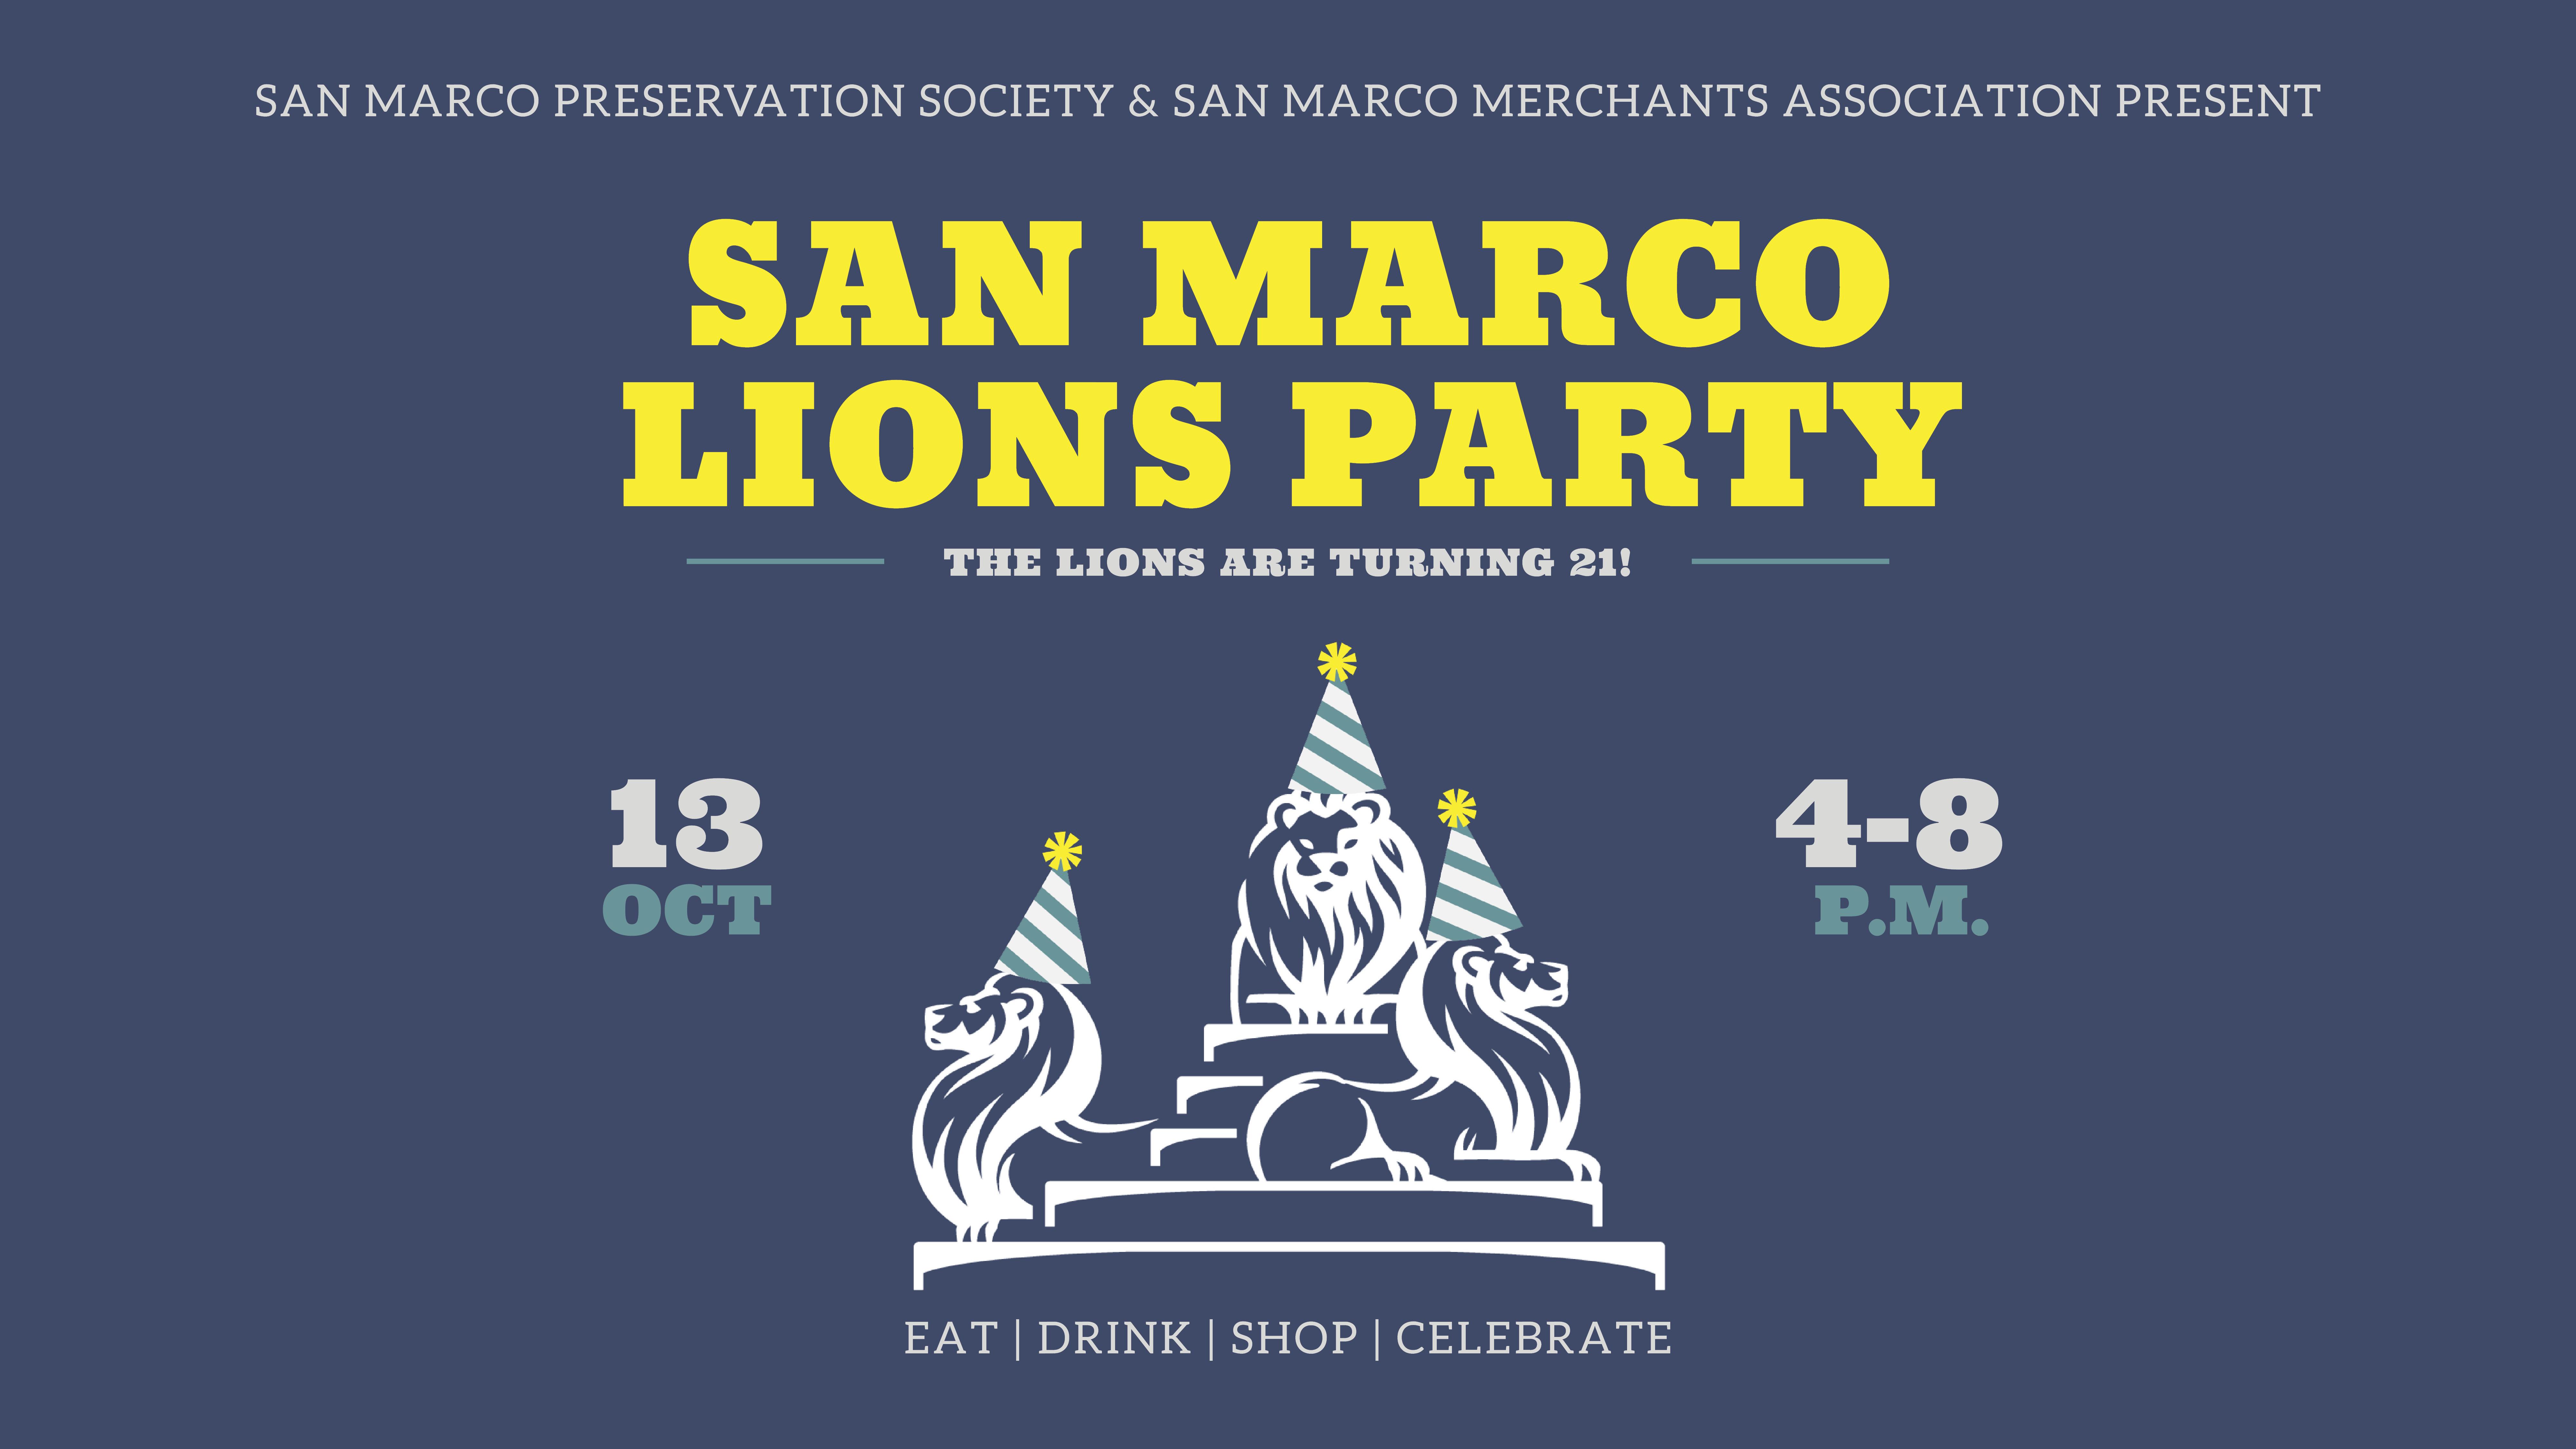 San Marco Lions Party